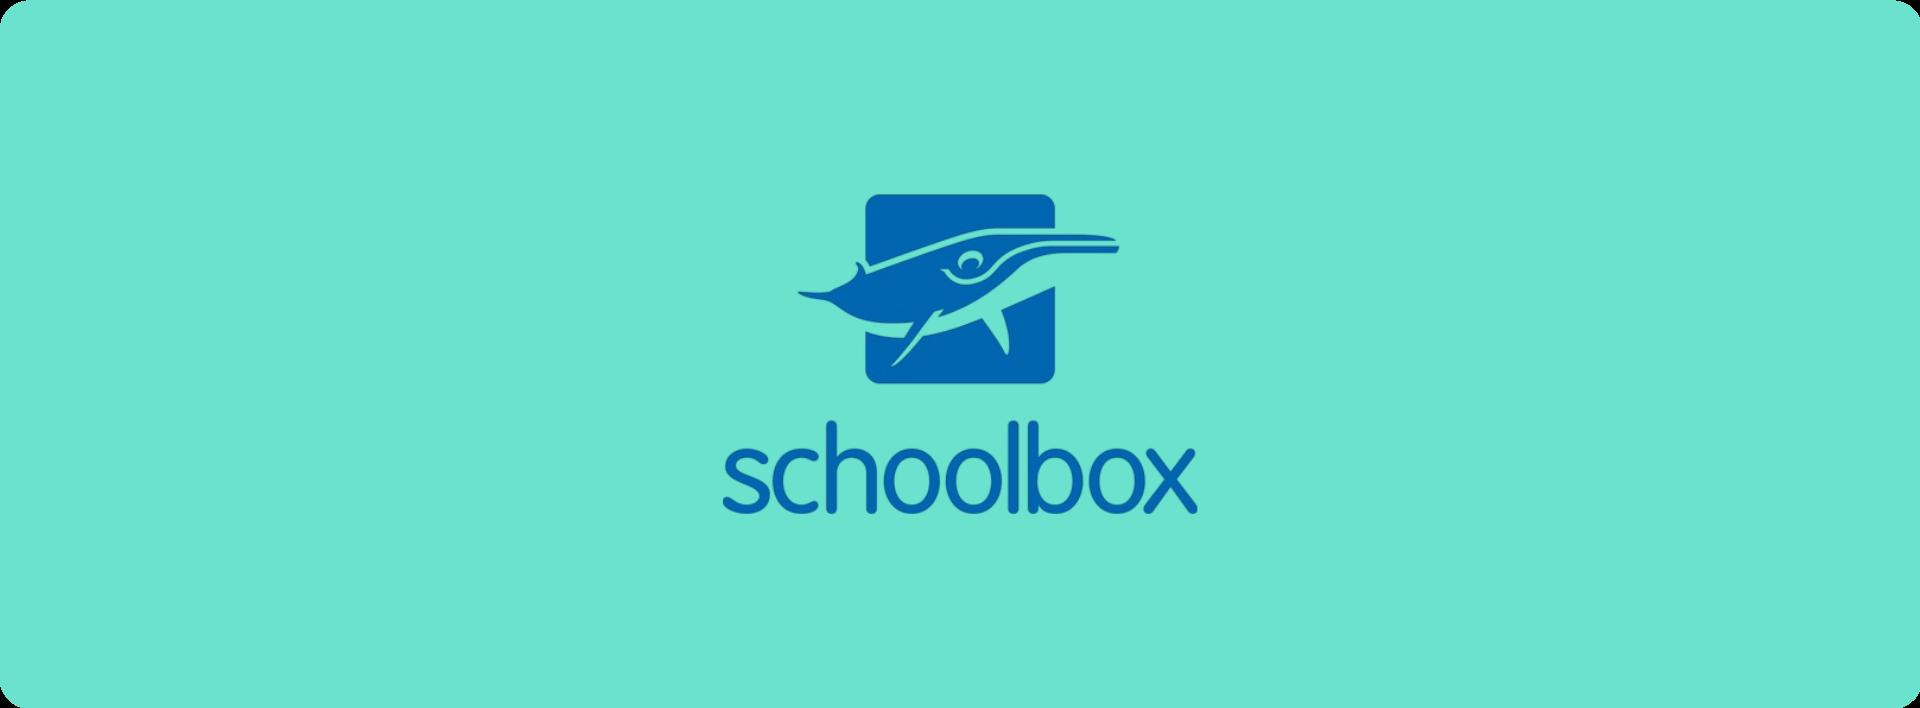 Schoolbox Image, Education Perfect